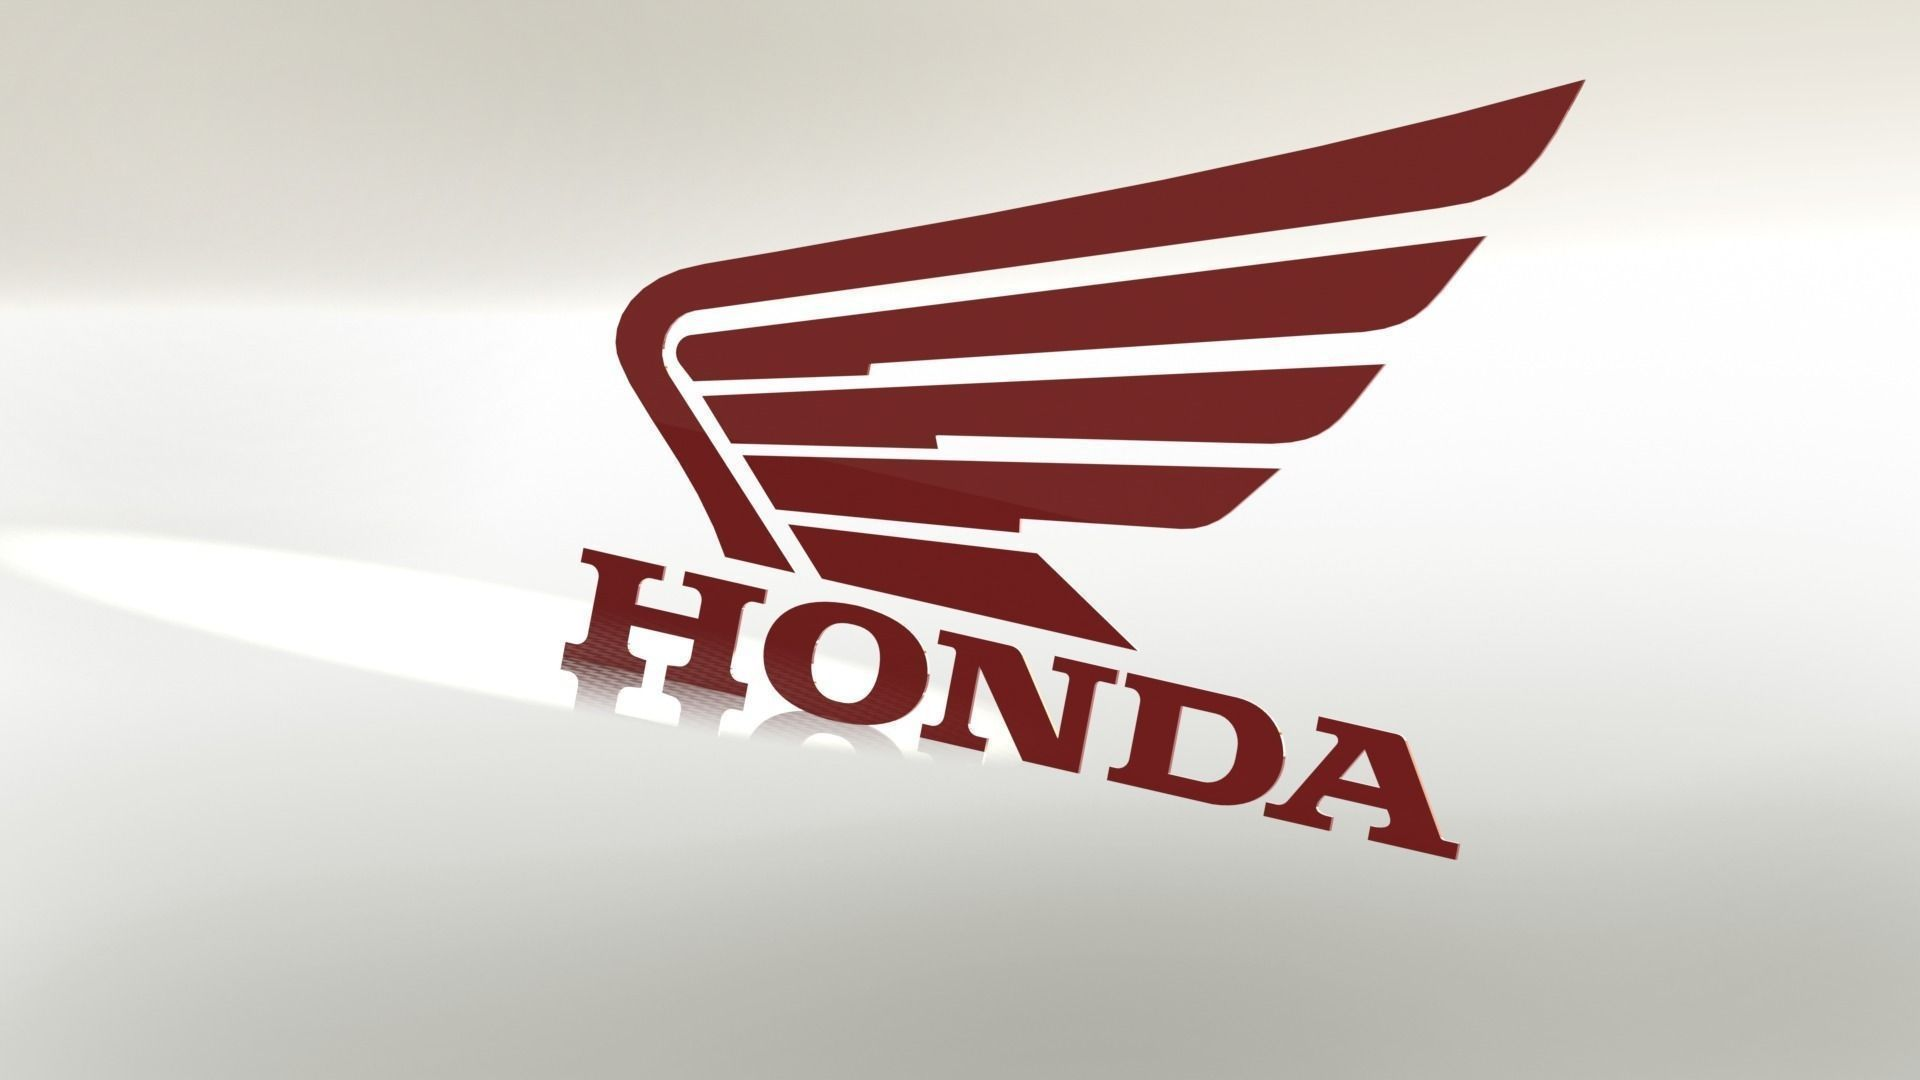 Honda Logo Free 3d Model Stl Sldprt Sldasm Slddrw Ige Igs